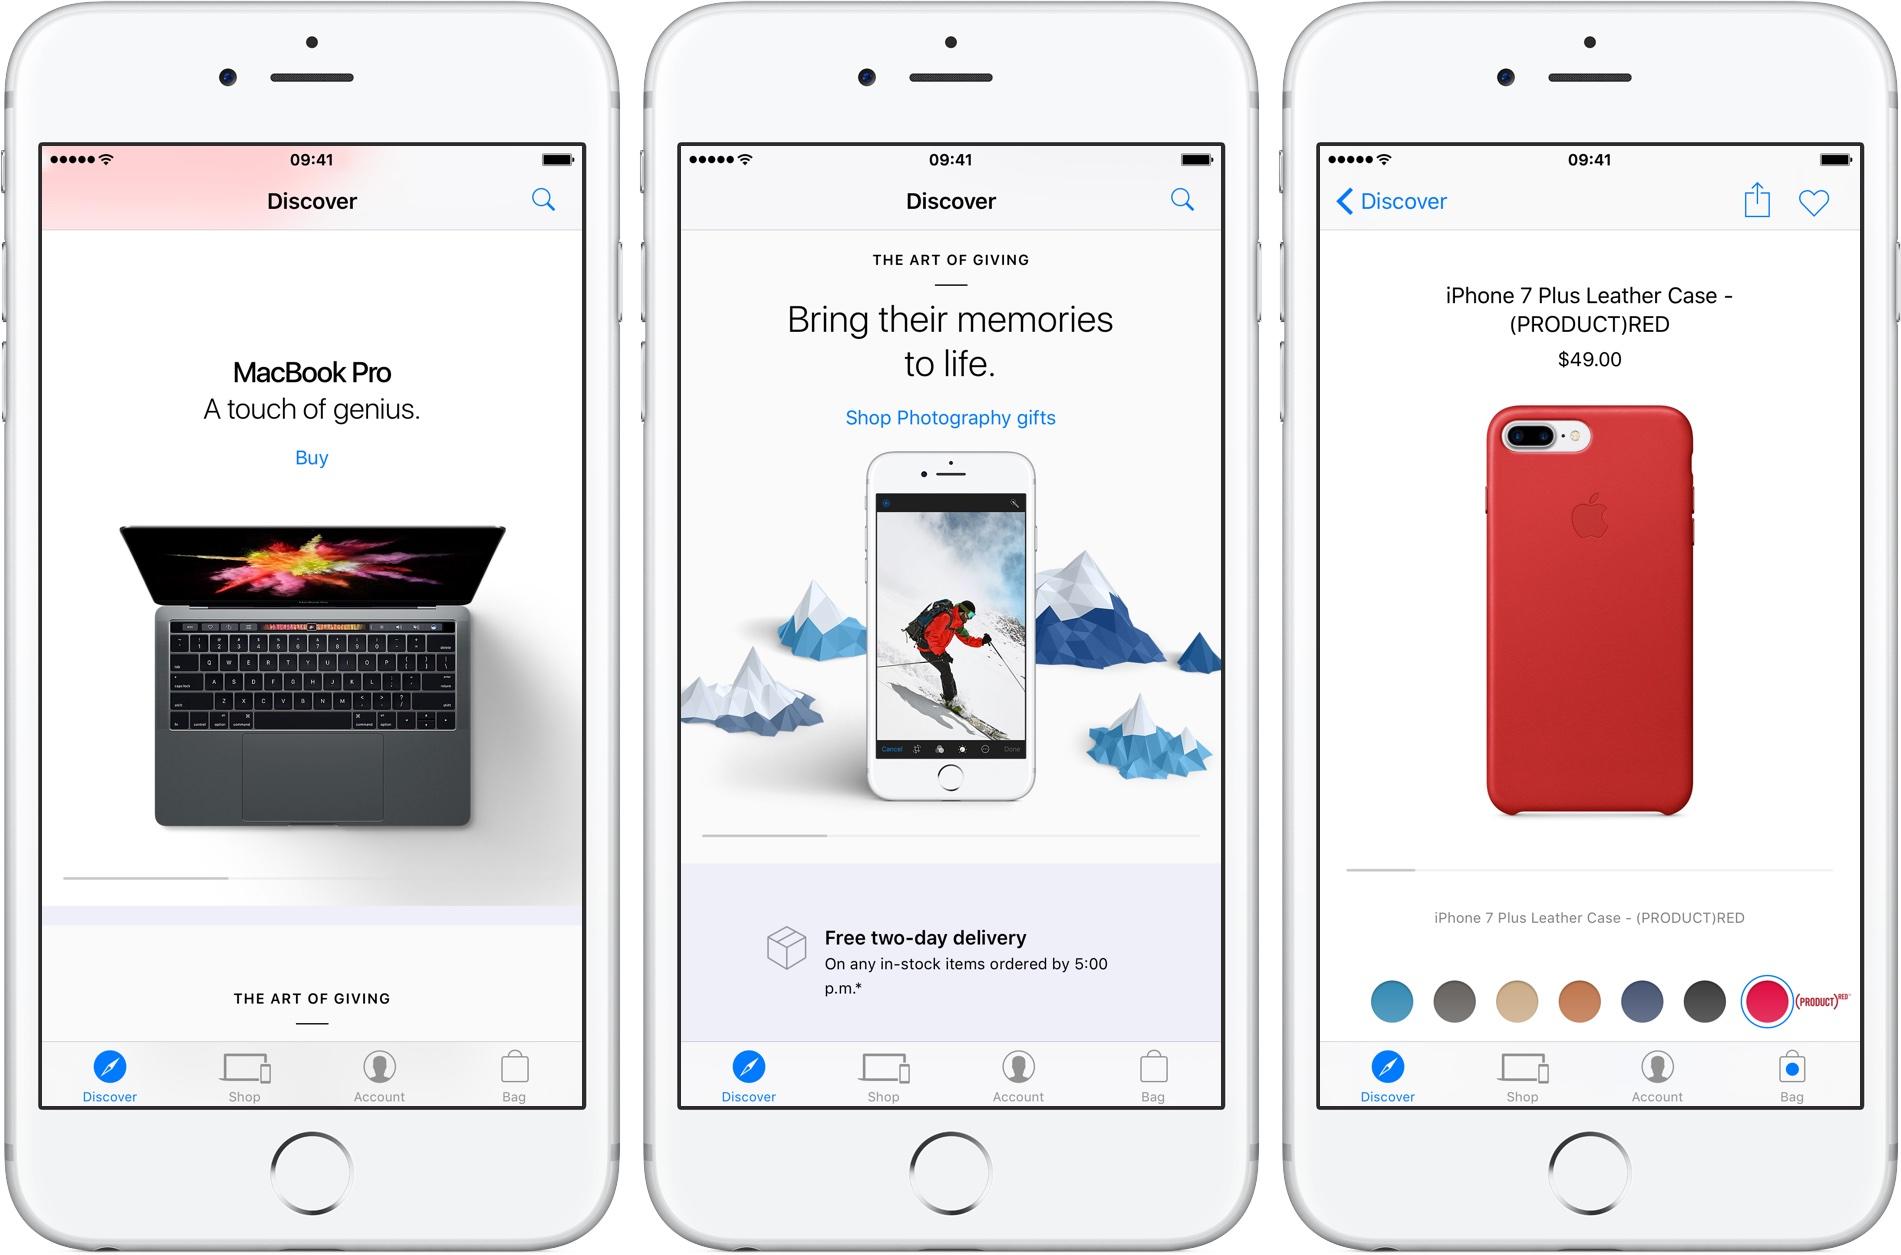 Captura de pantalla 001 de Apple Store 4.1 para iOS iPhone